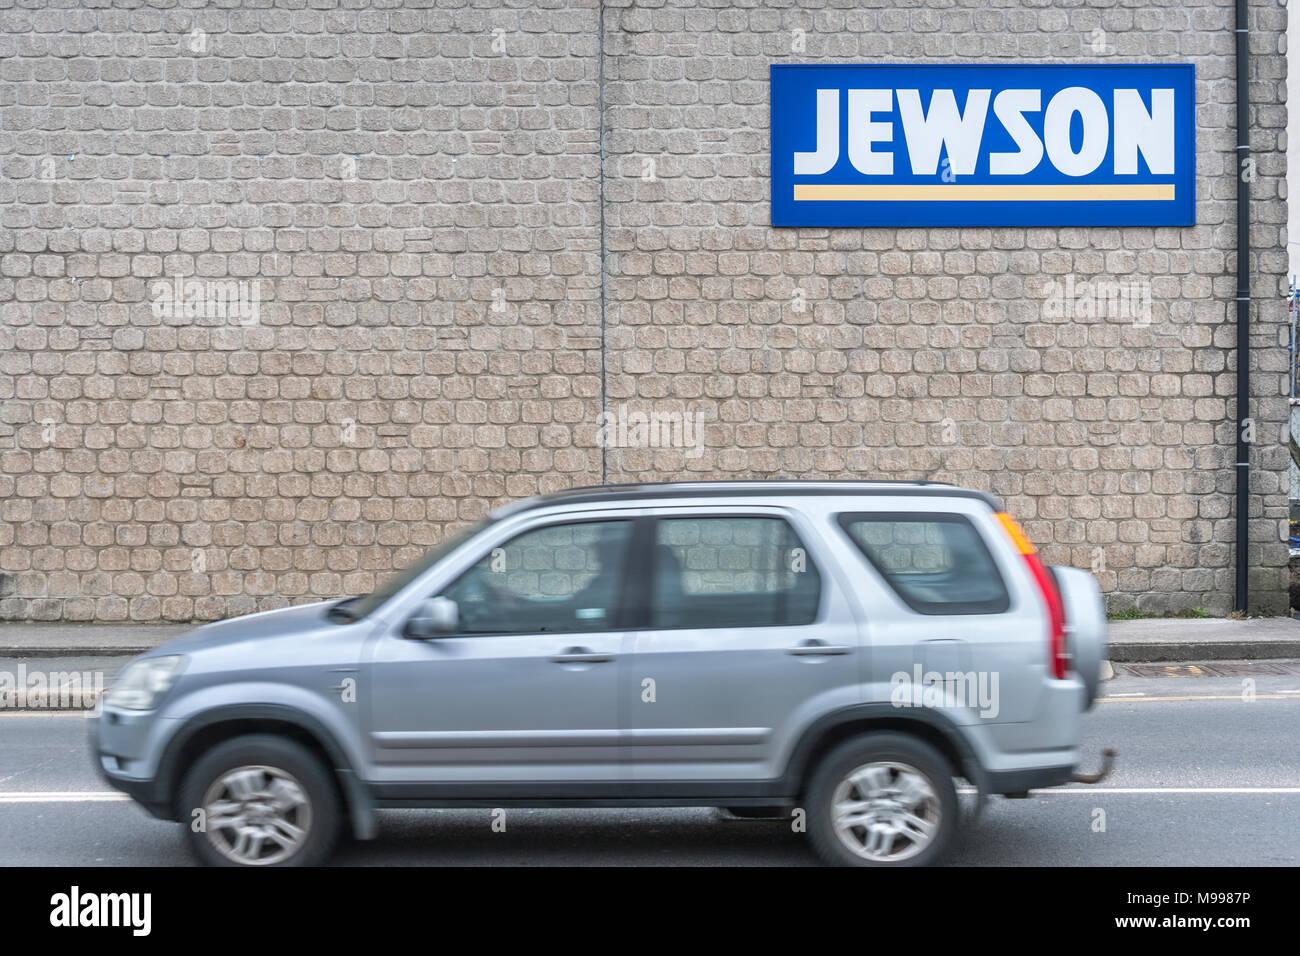 Exteior of Jewson (builder's merchants / construction supplies) yard at Plymouth, Devon. - Stock Image